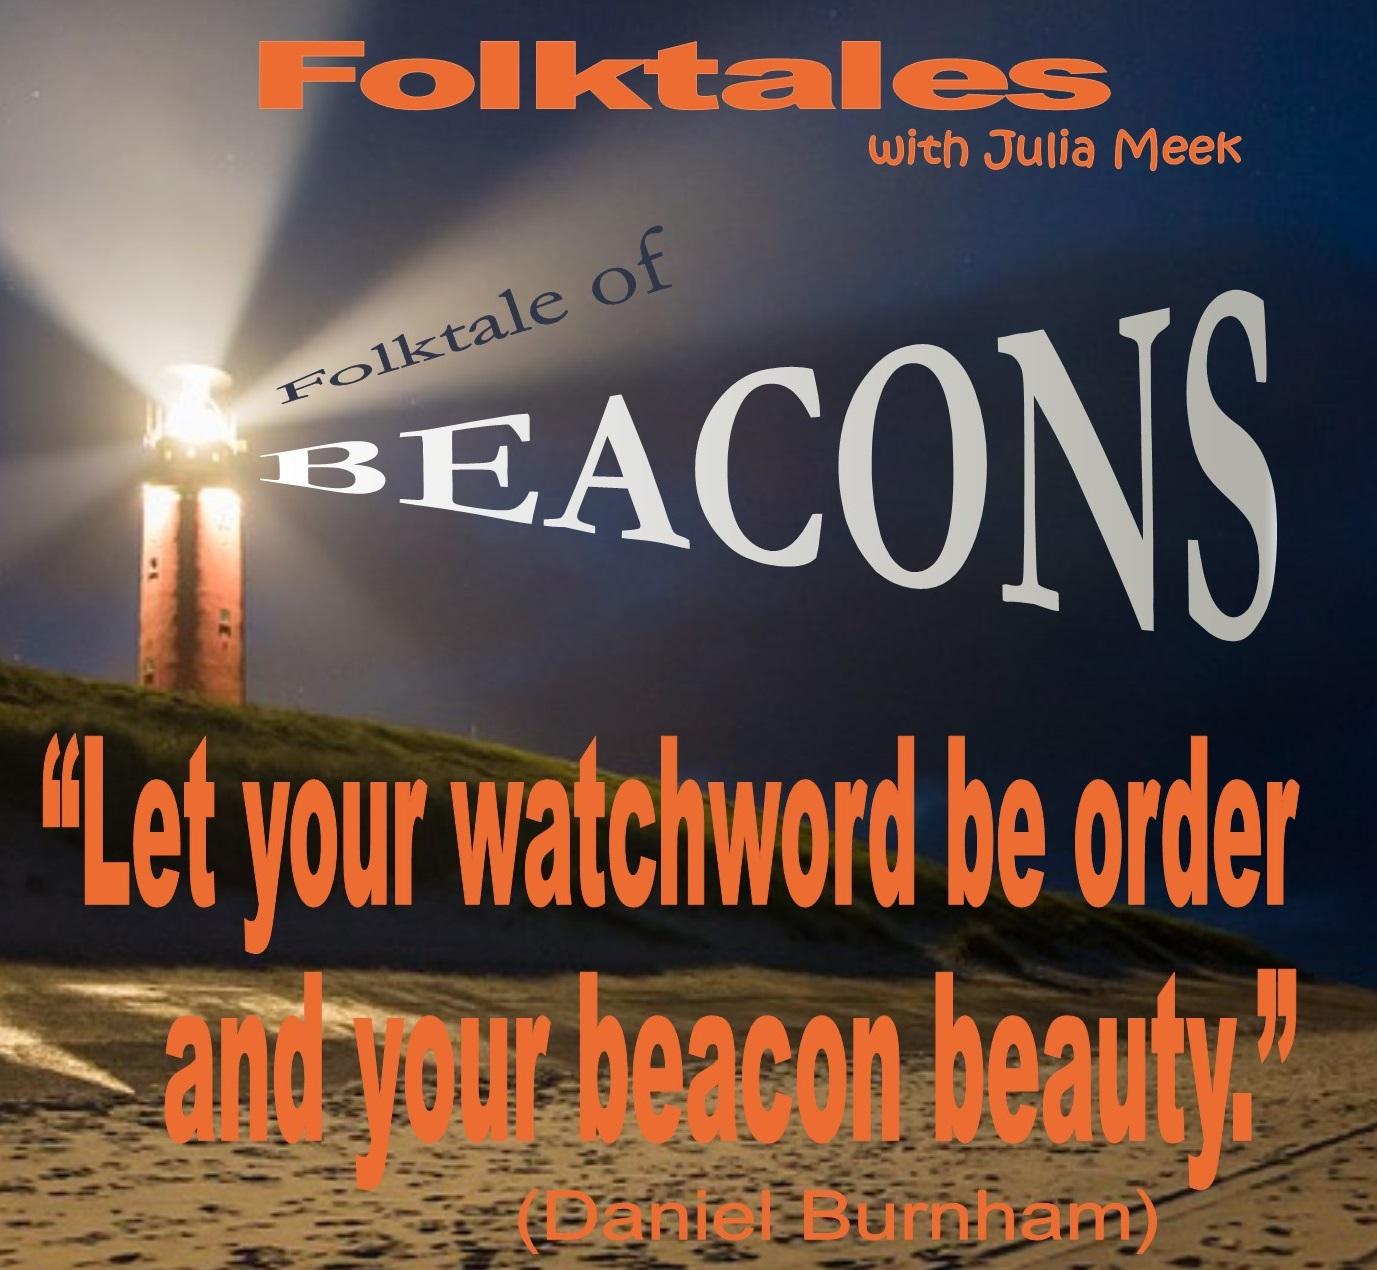 Caption: Folktale of Beacons, Credit: Julia Meek